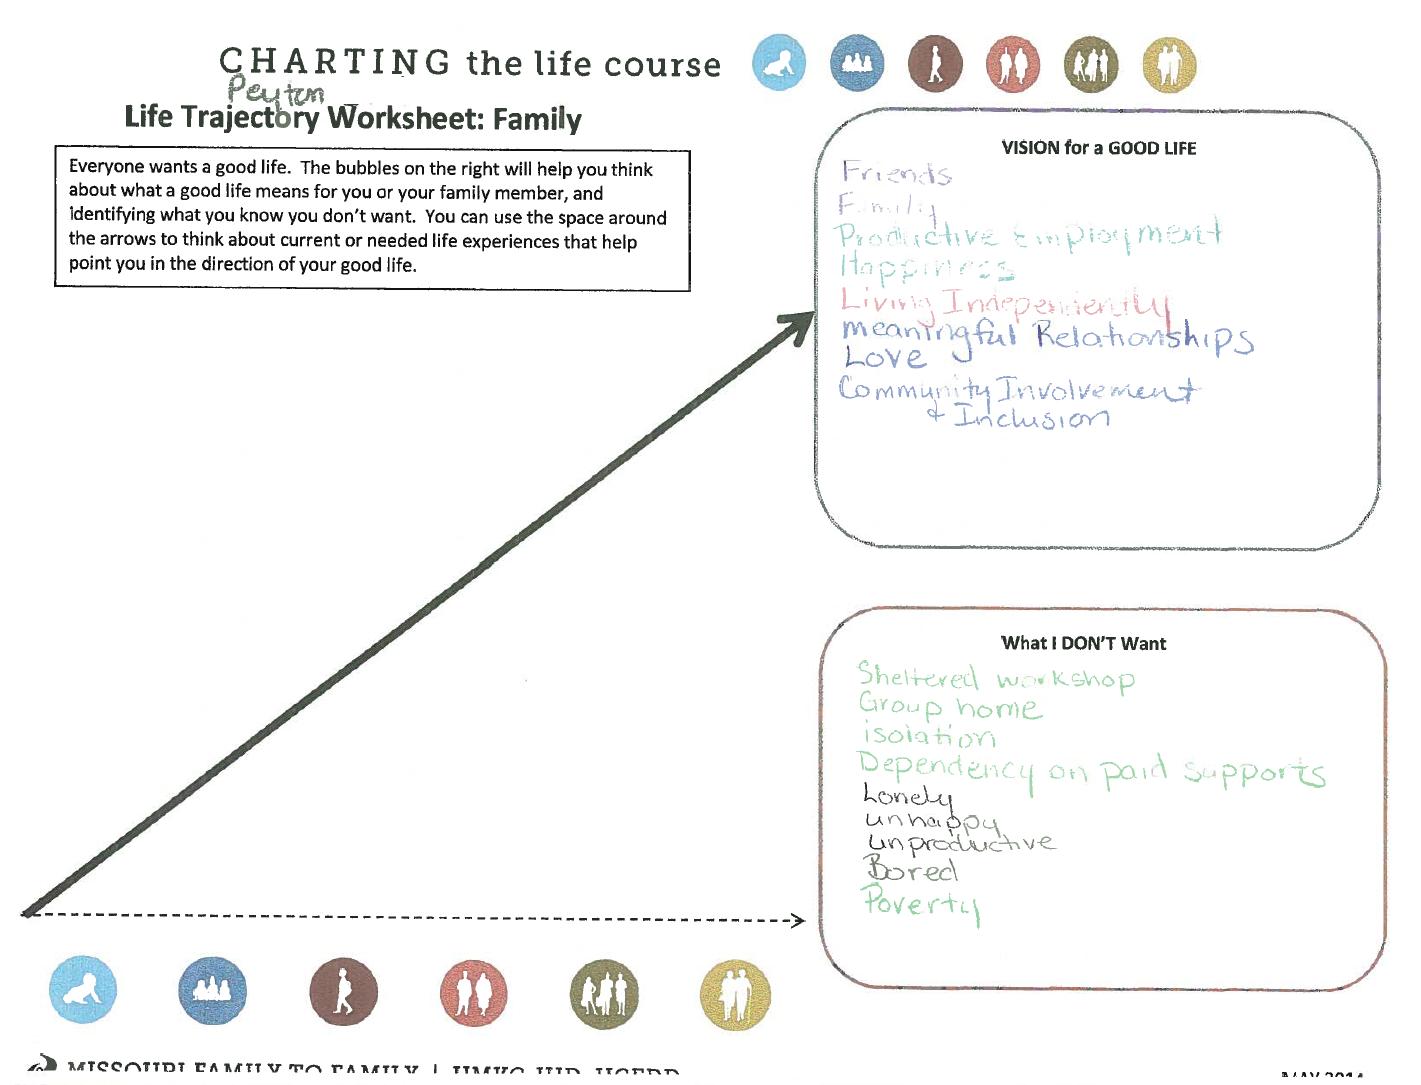 Photo: Peyton's Life Trajectory Worksheet